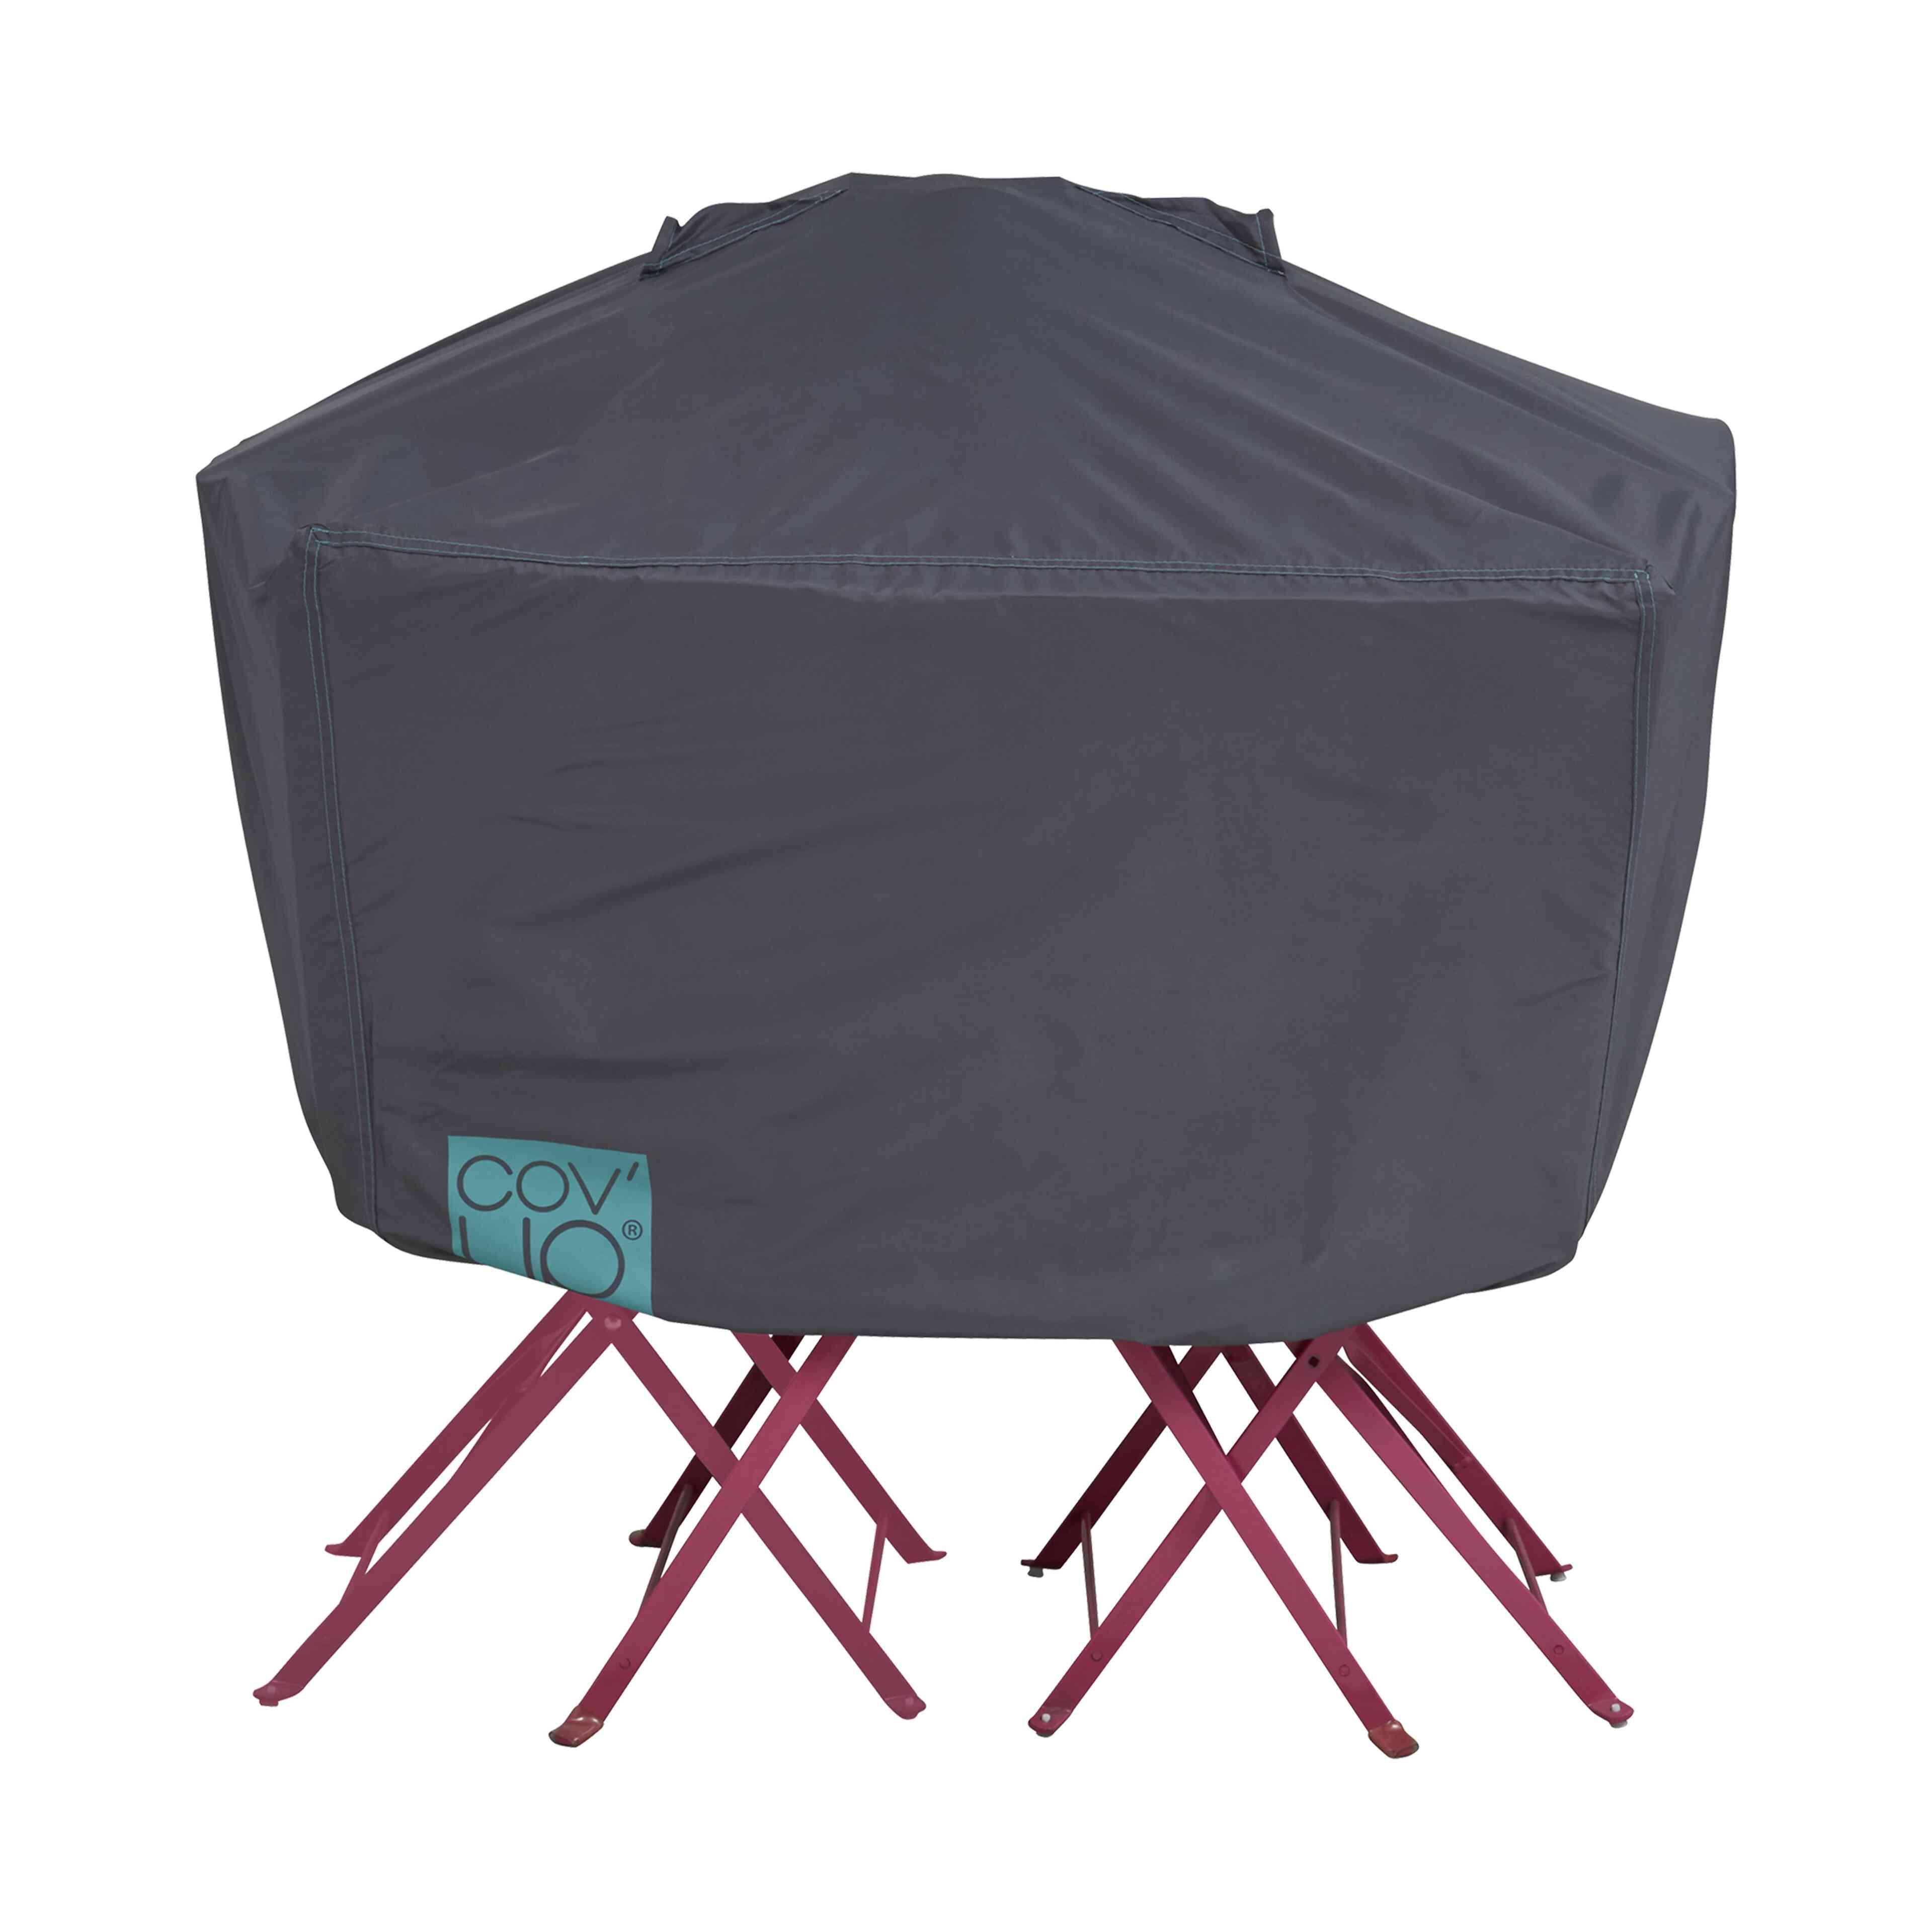 housse de protection table de jardin oviala. Black Bedroom Furniture Sets. Home Design Ideas